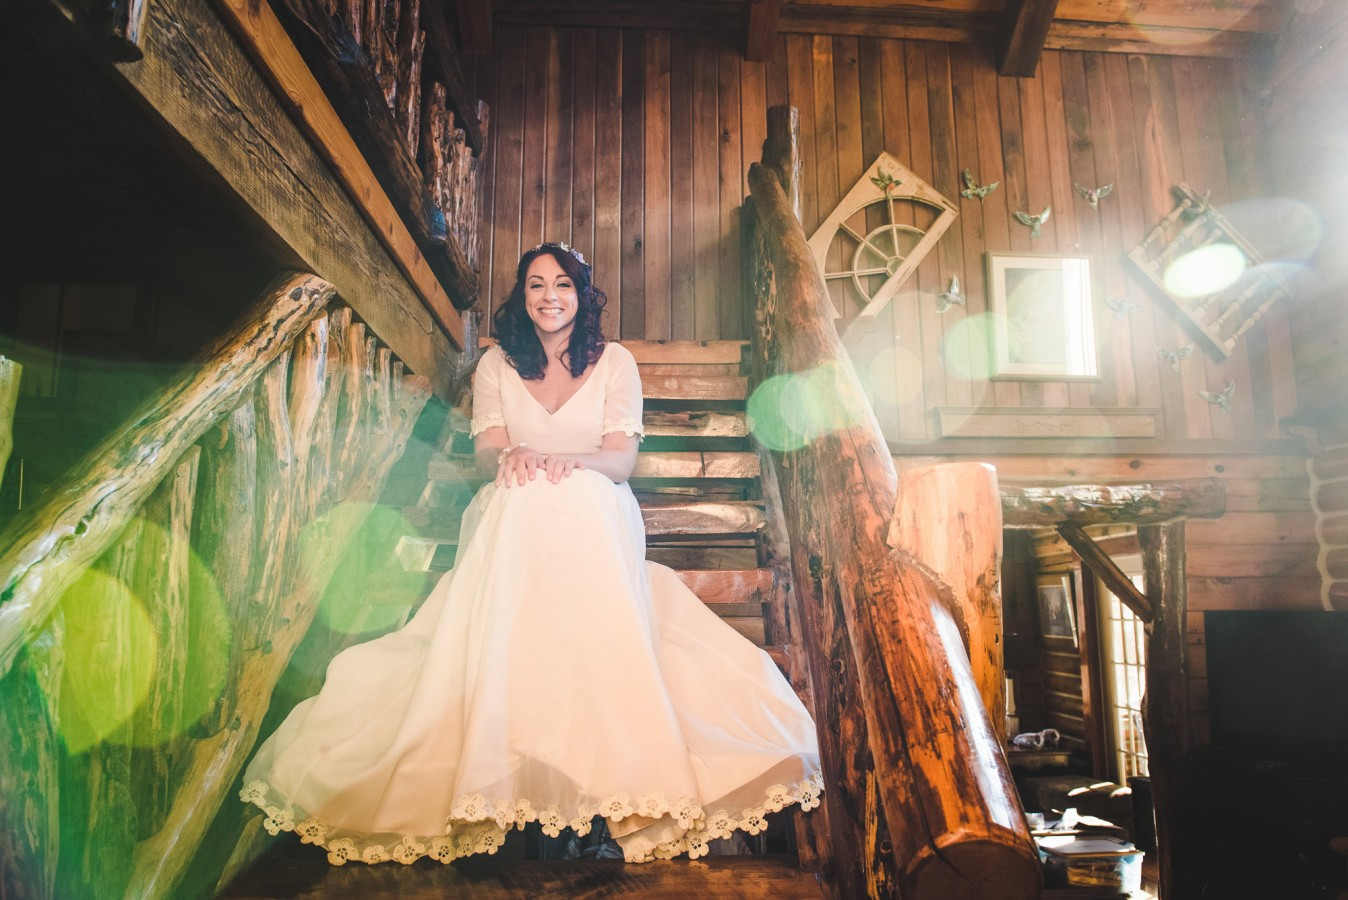 asheville-wedding-photographer-032